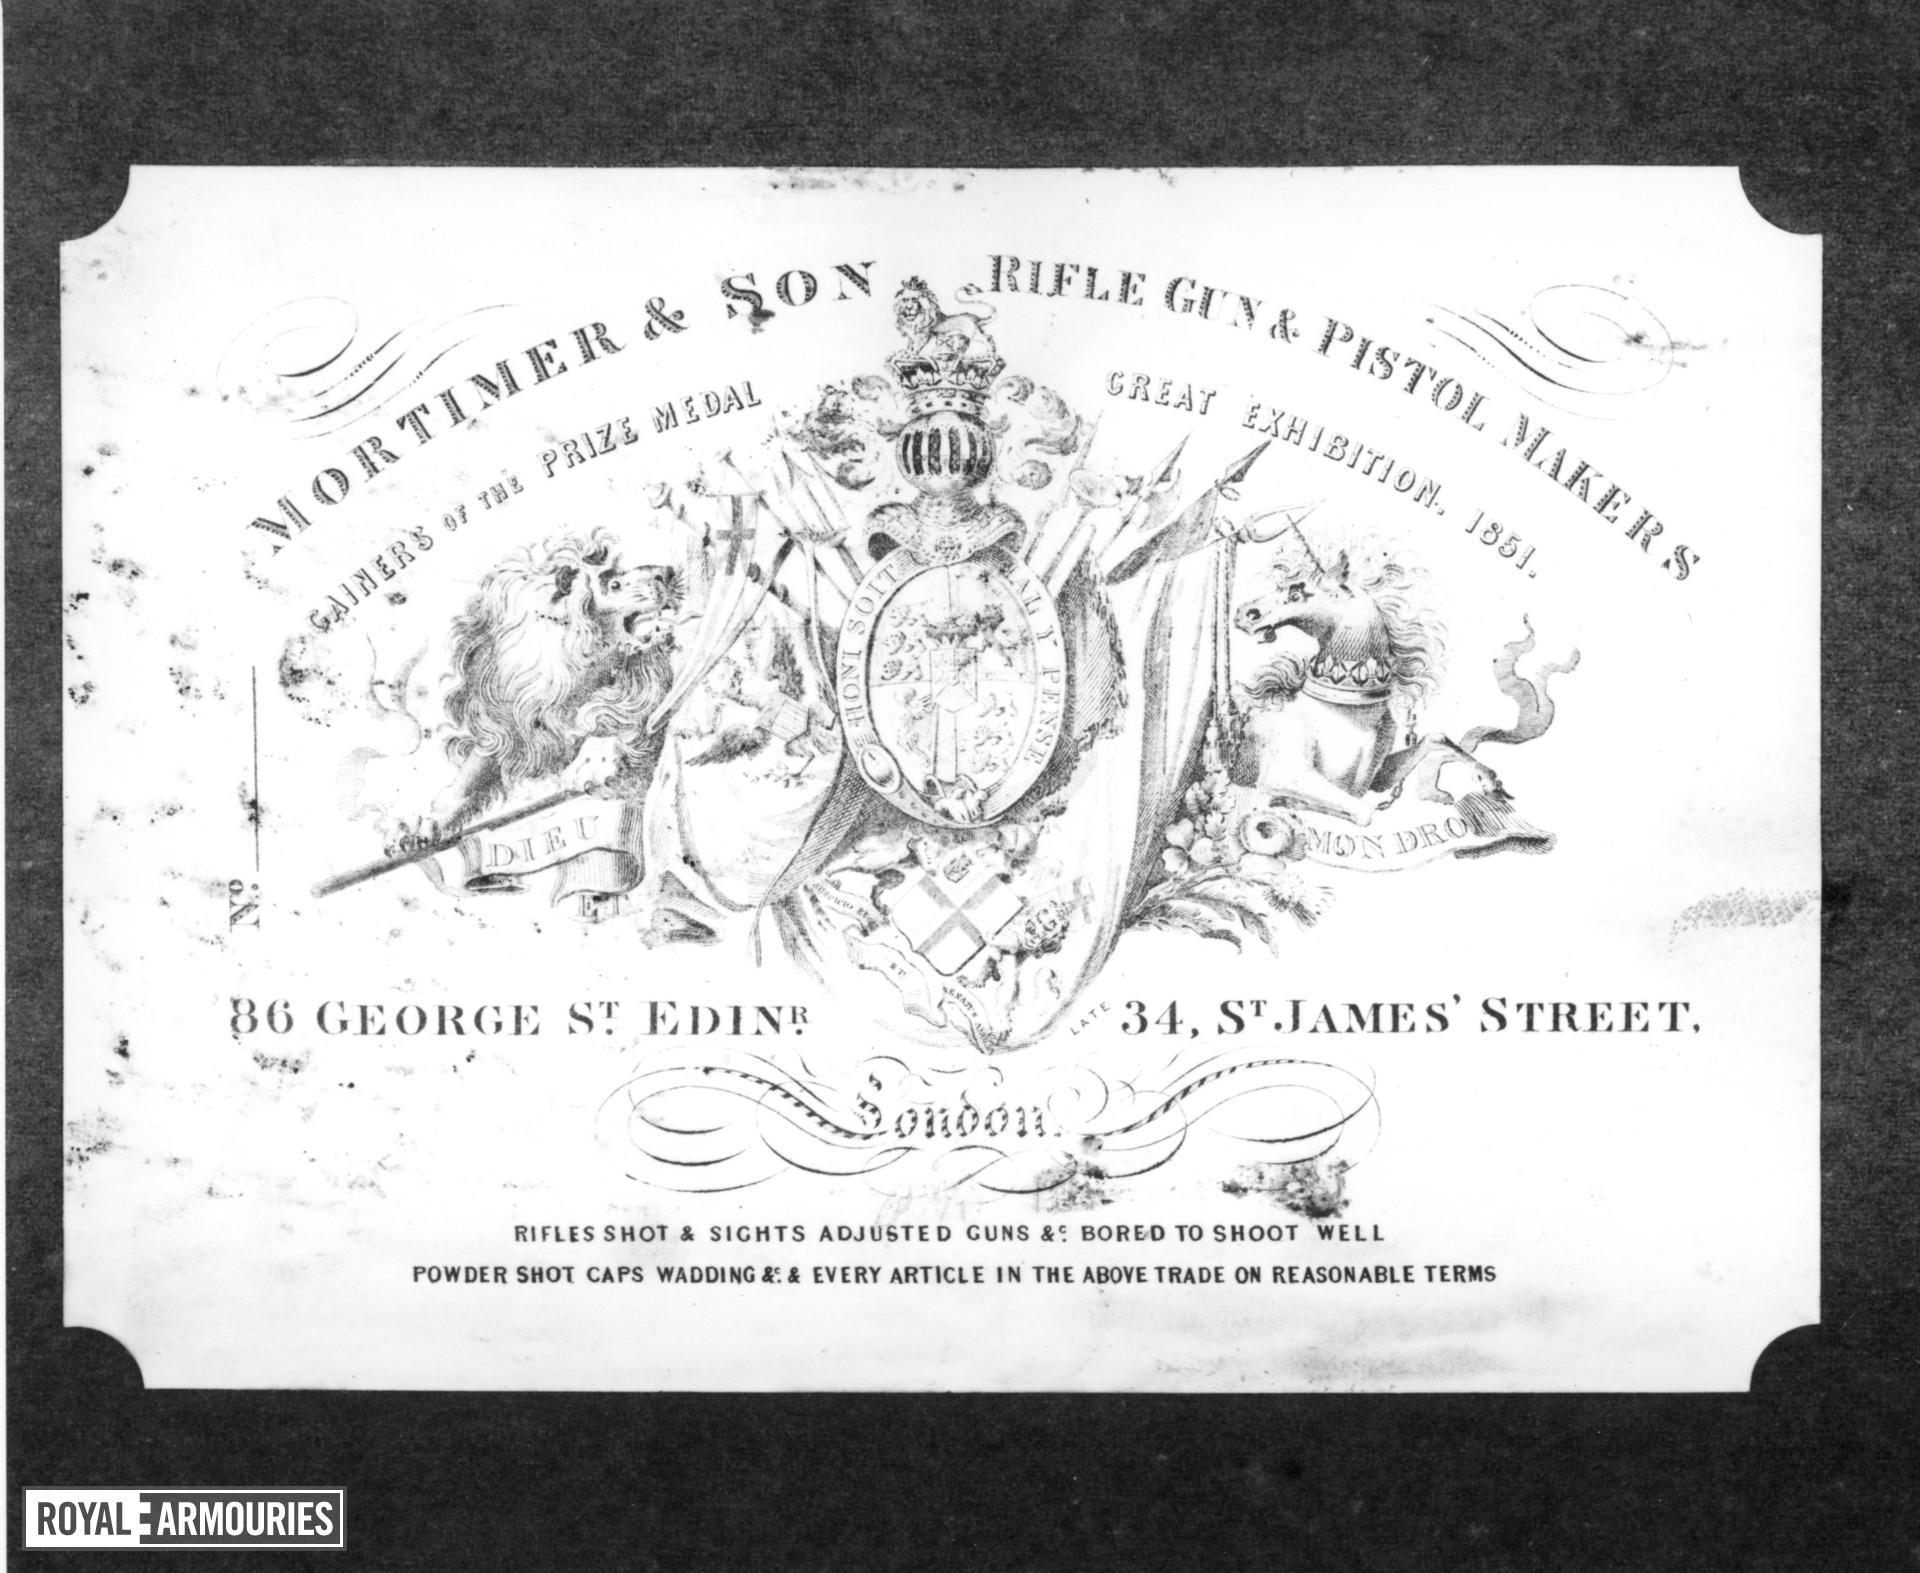 Flintlock sporting gun - By Mortimer Cased